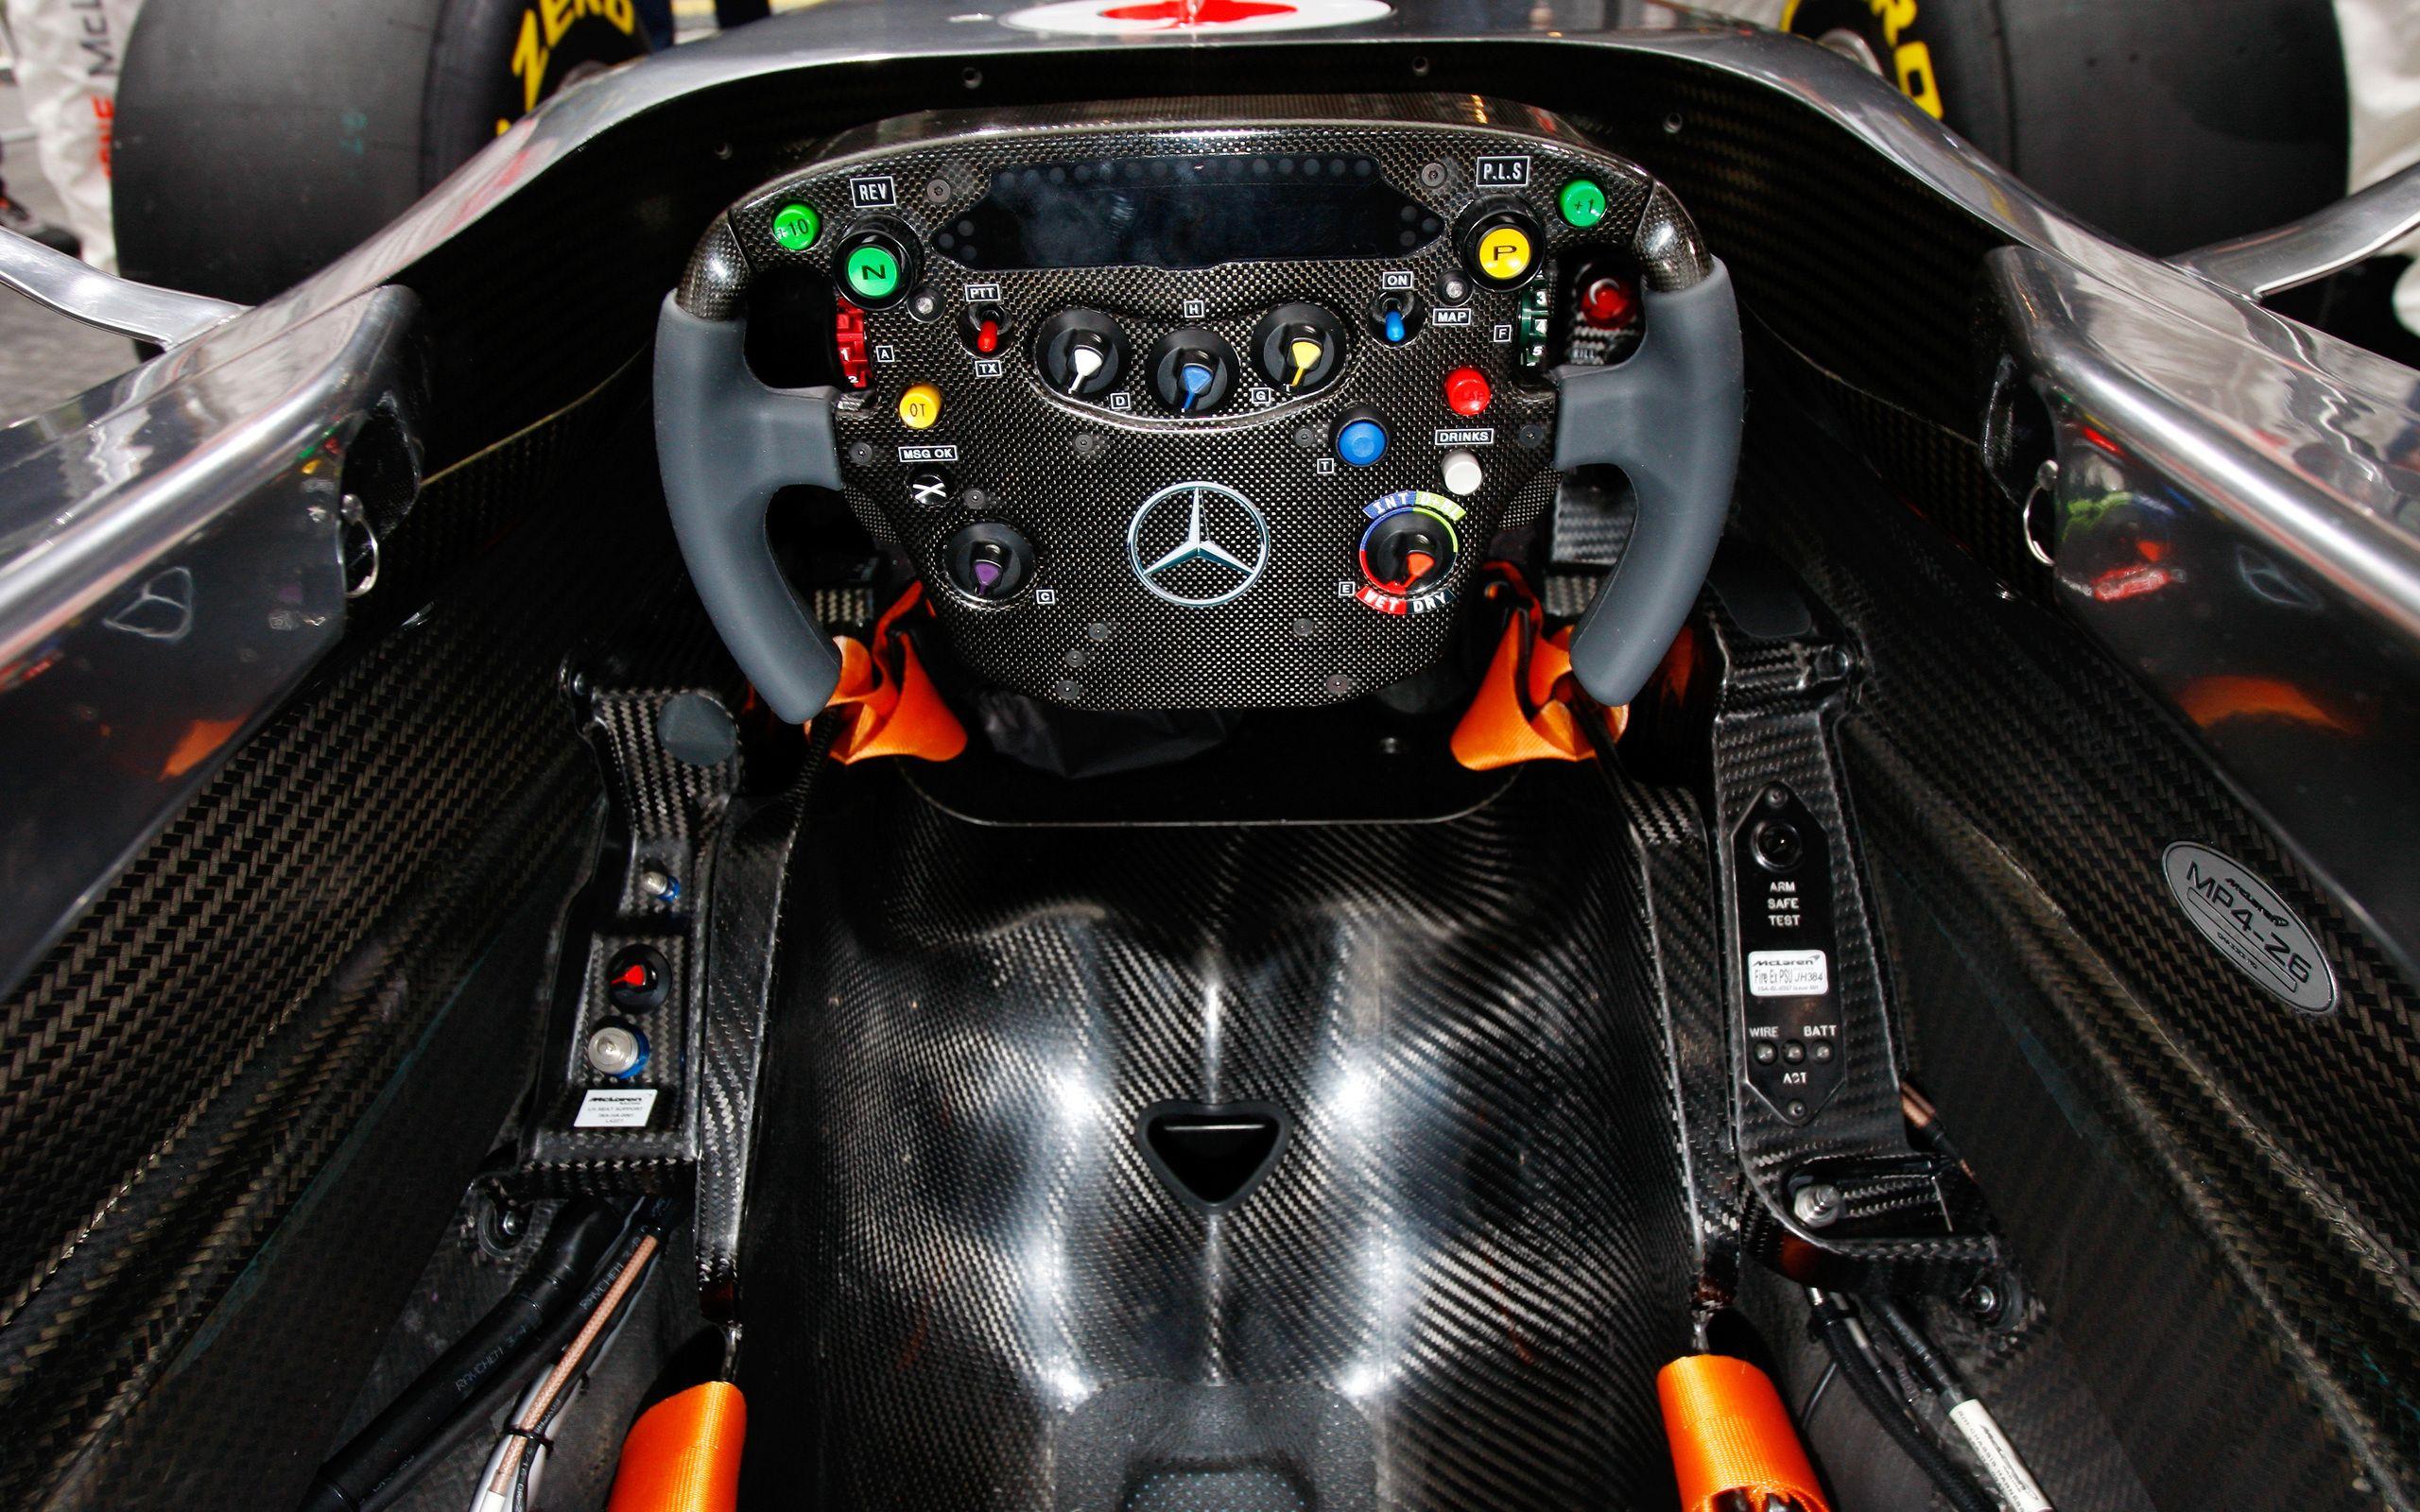 F1 Mercedes Wallpaper Widescreen Fip Cars Cars Mclaren F1